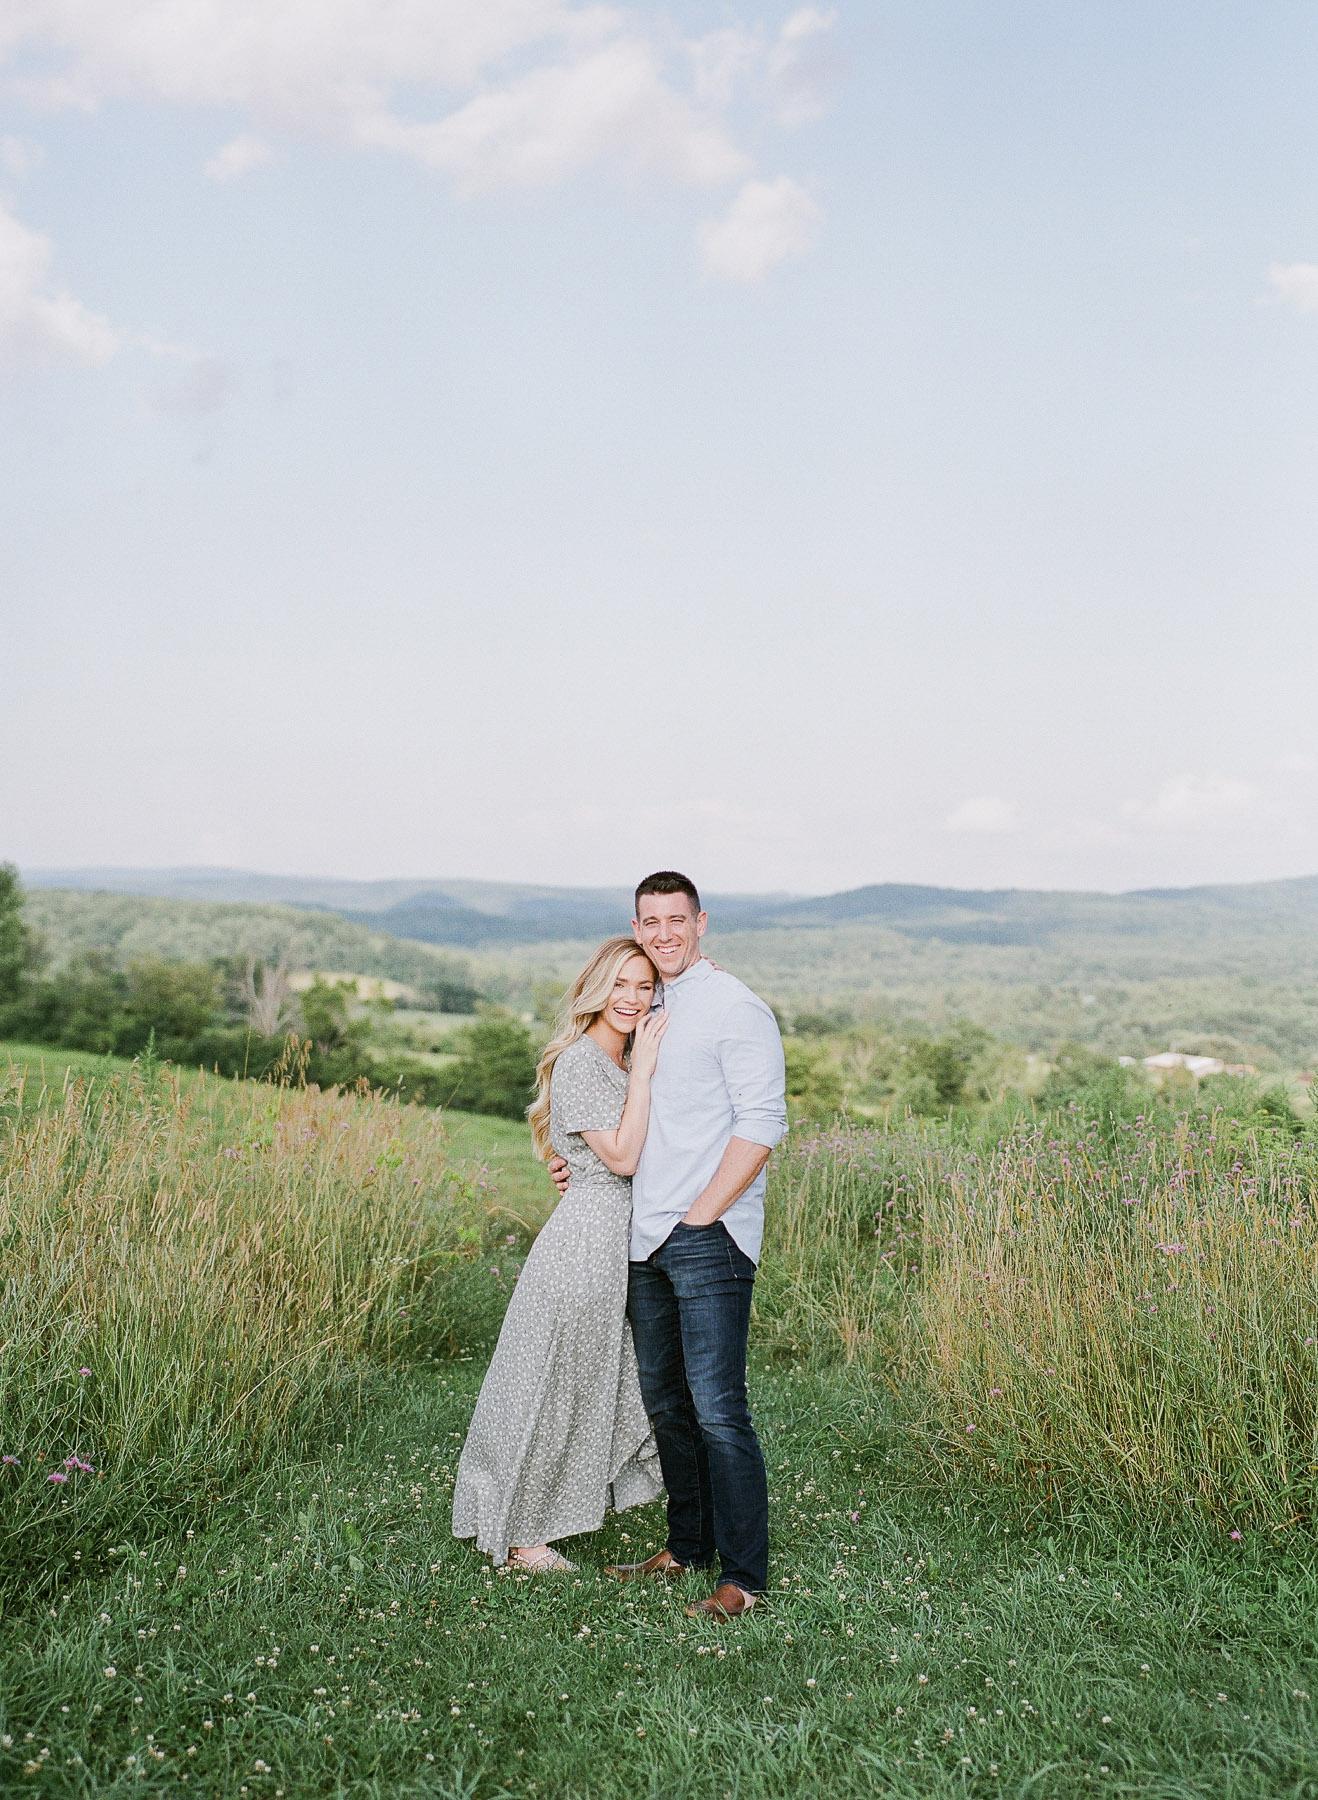 Chappell Engagement -8.jpg